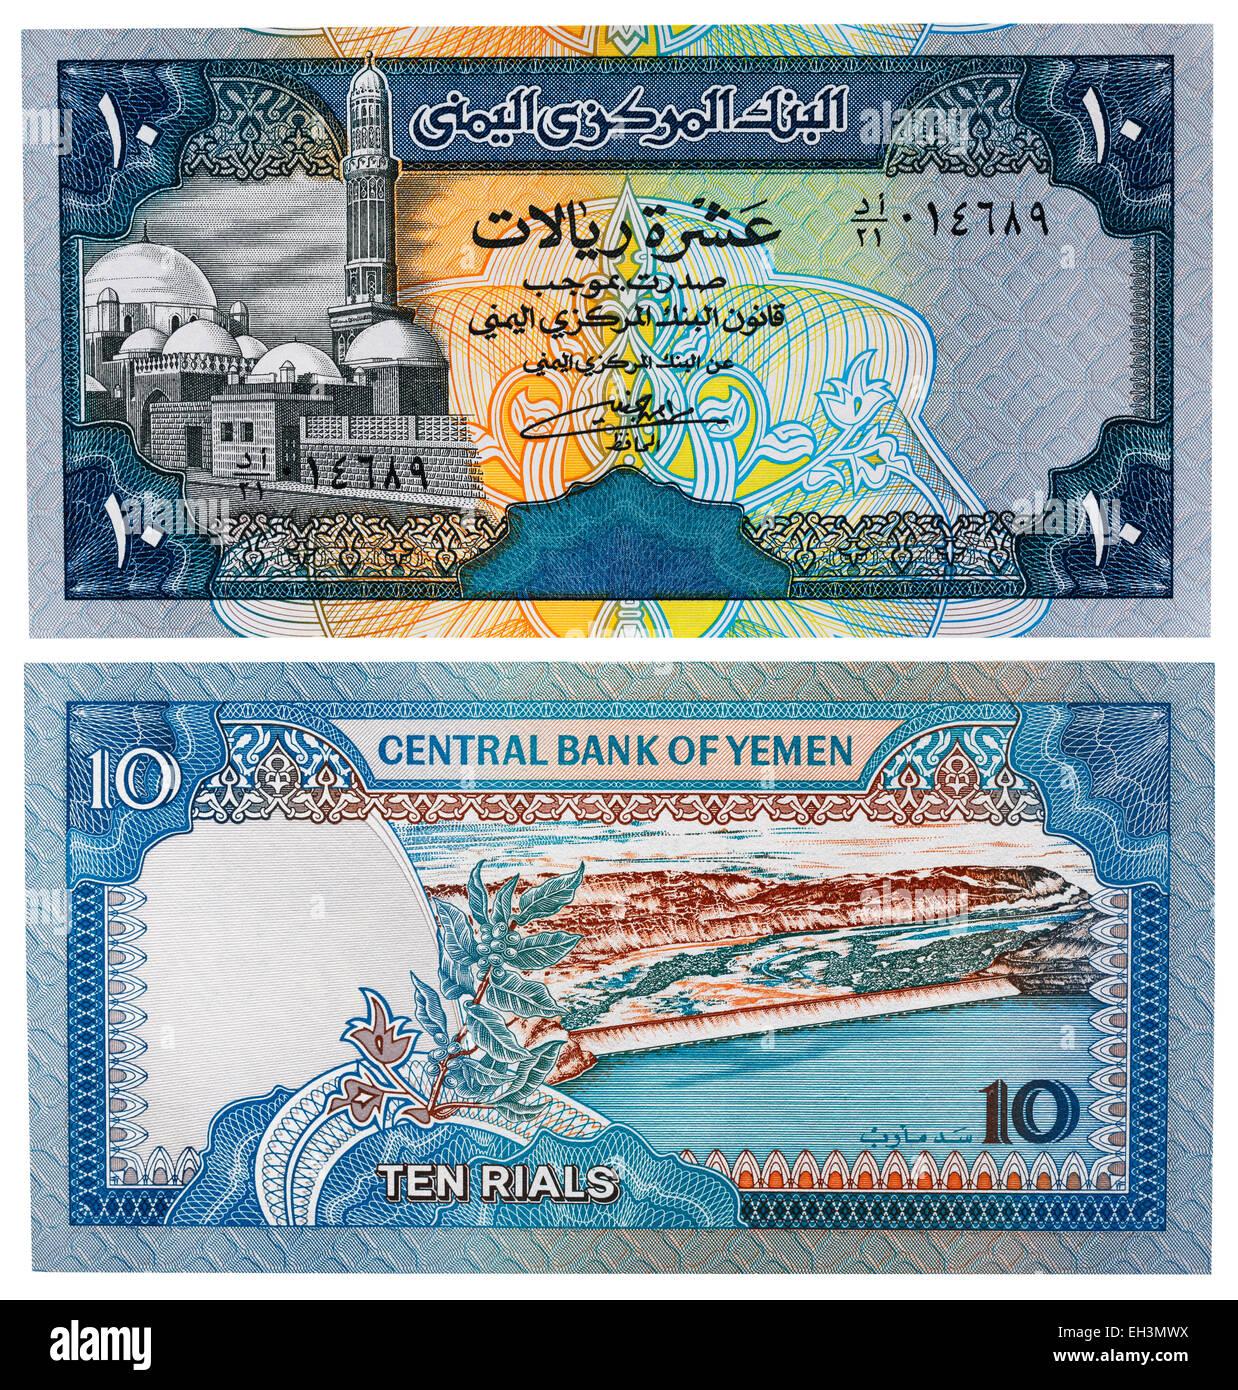 10 rials banknote, Qubbat Al-Bakiliyah Mosque, Yemen, 1990 - Stock Image